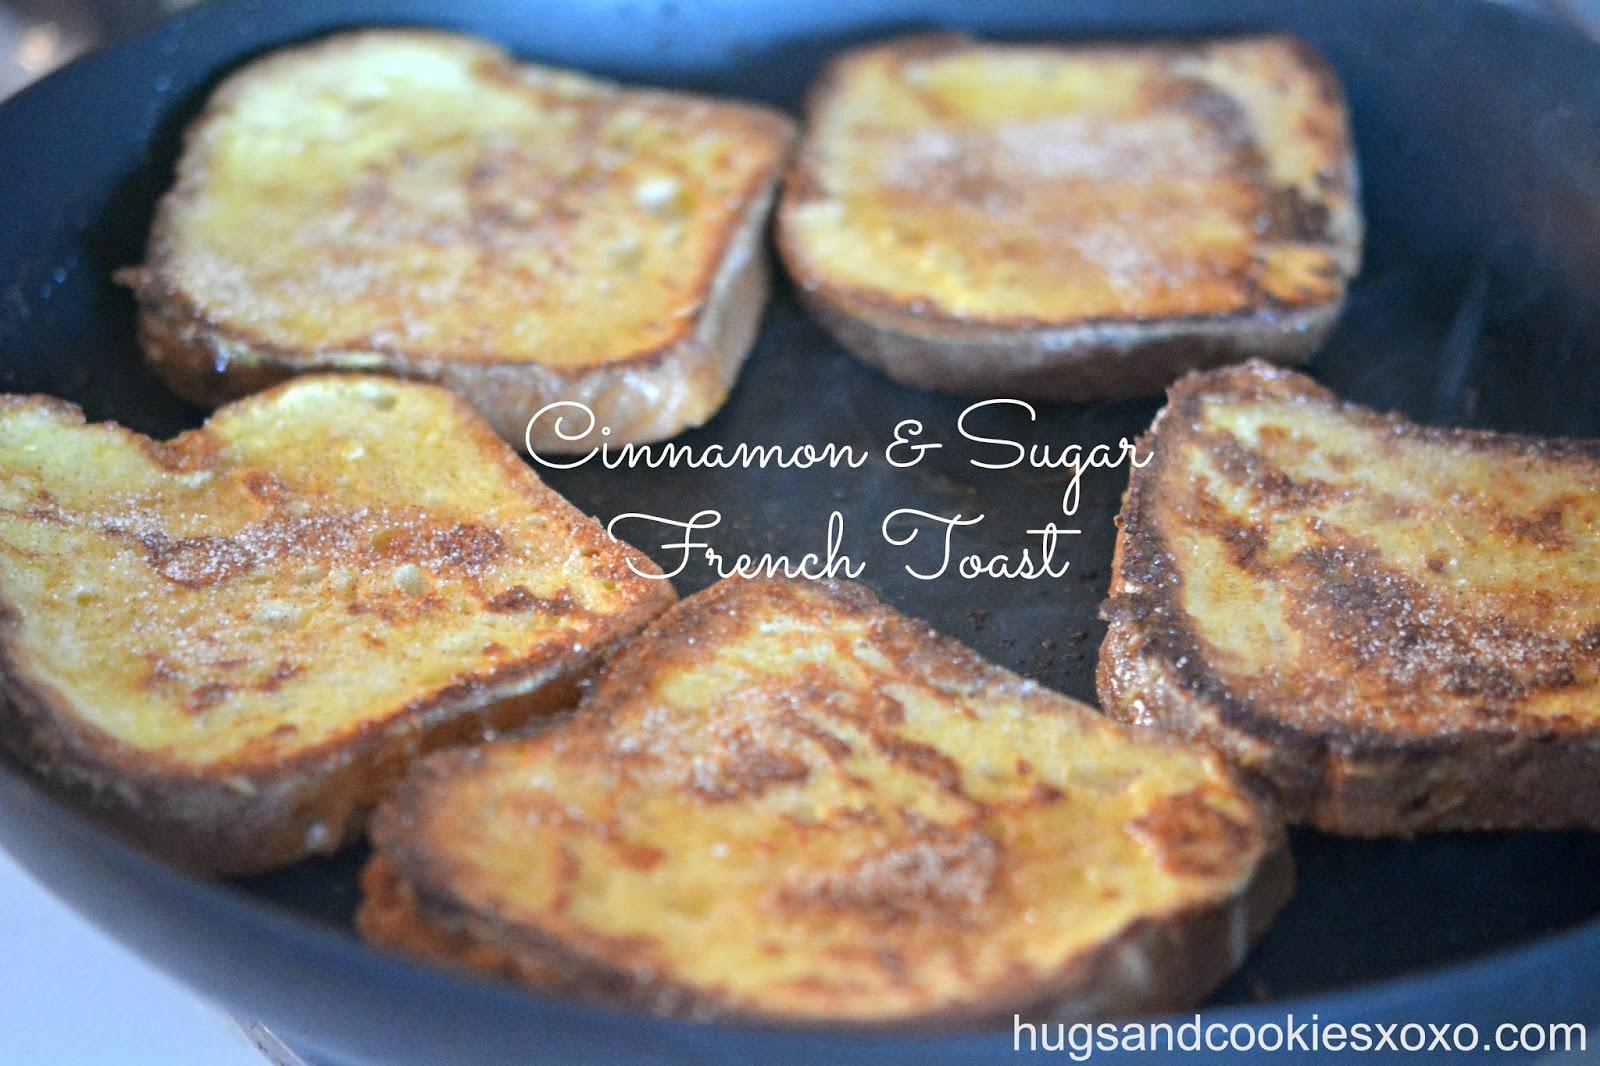 CINNAMON & SUGAR FRENCH TOAST - Hugs and Cookies XOXO